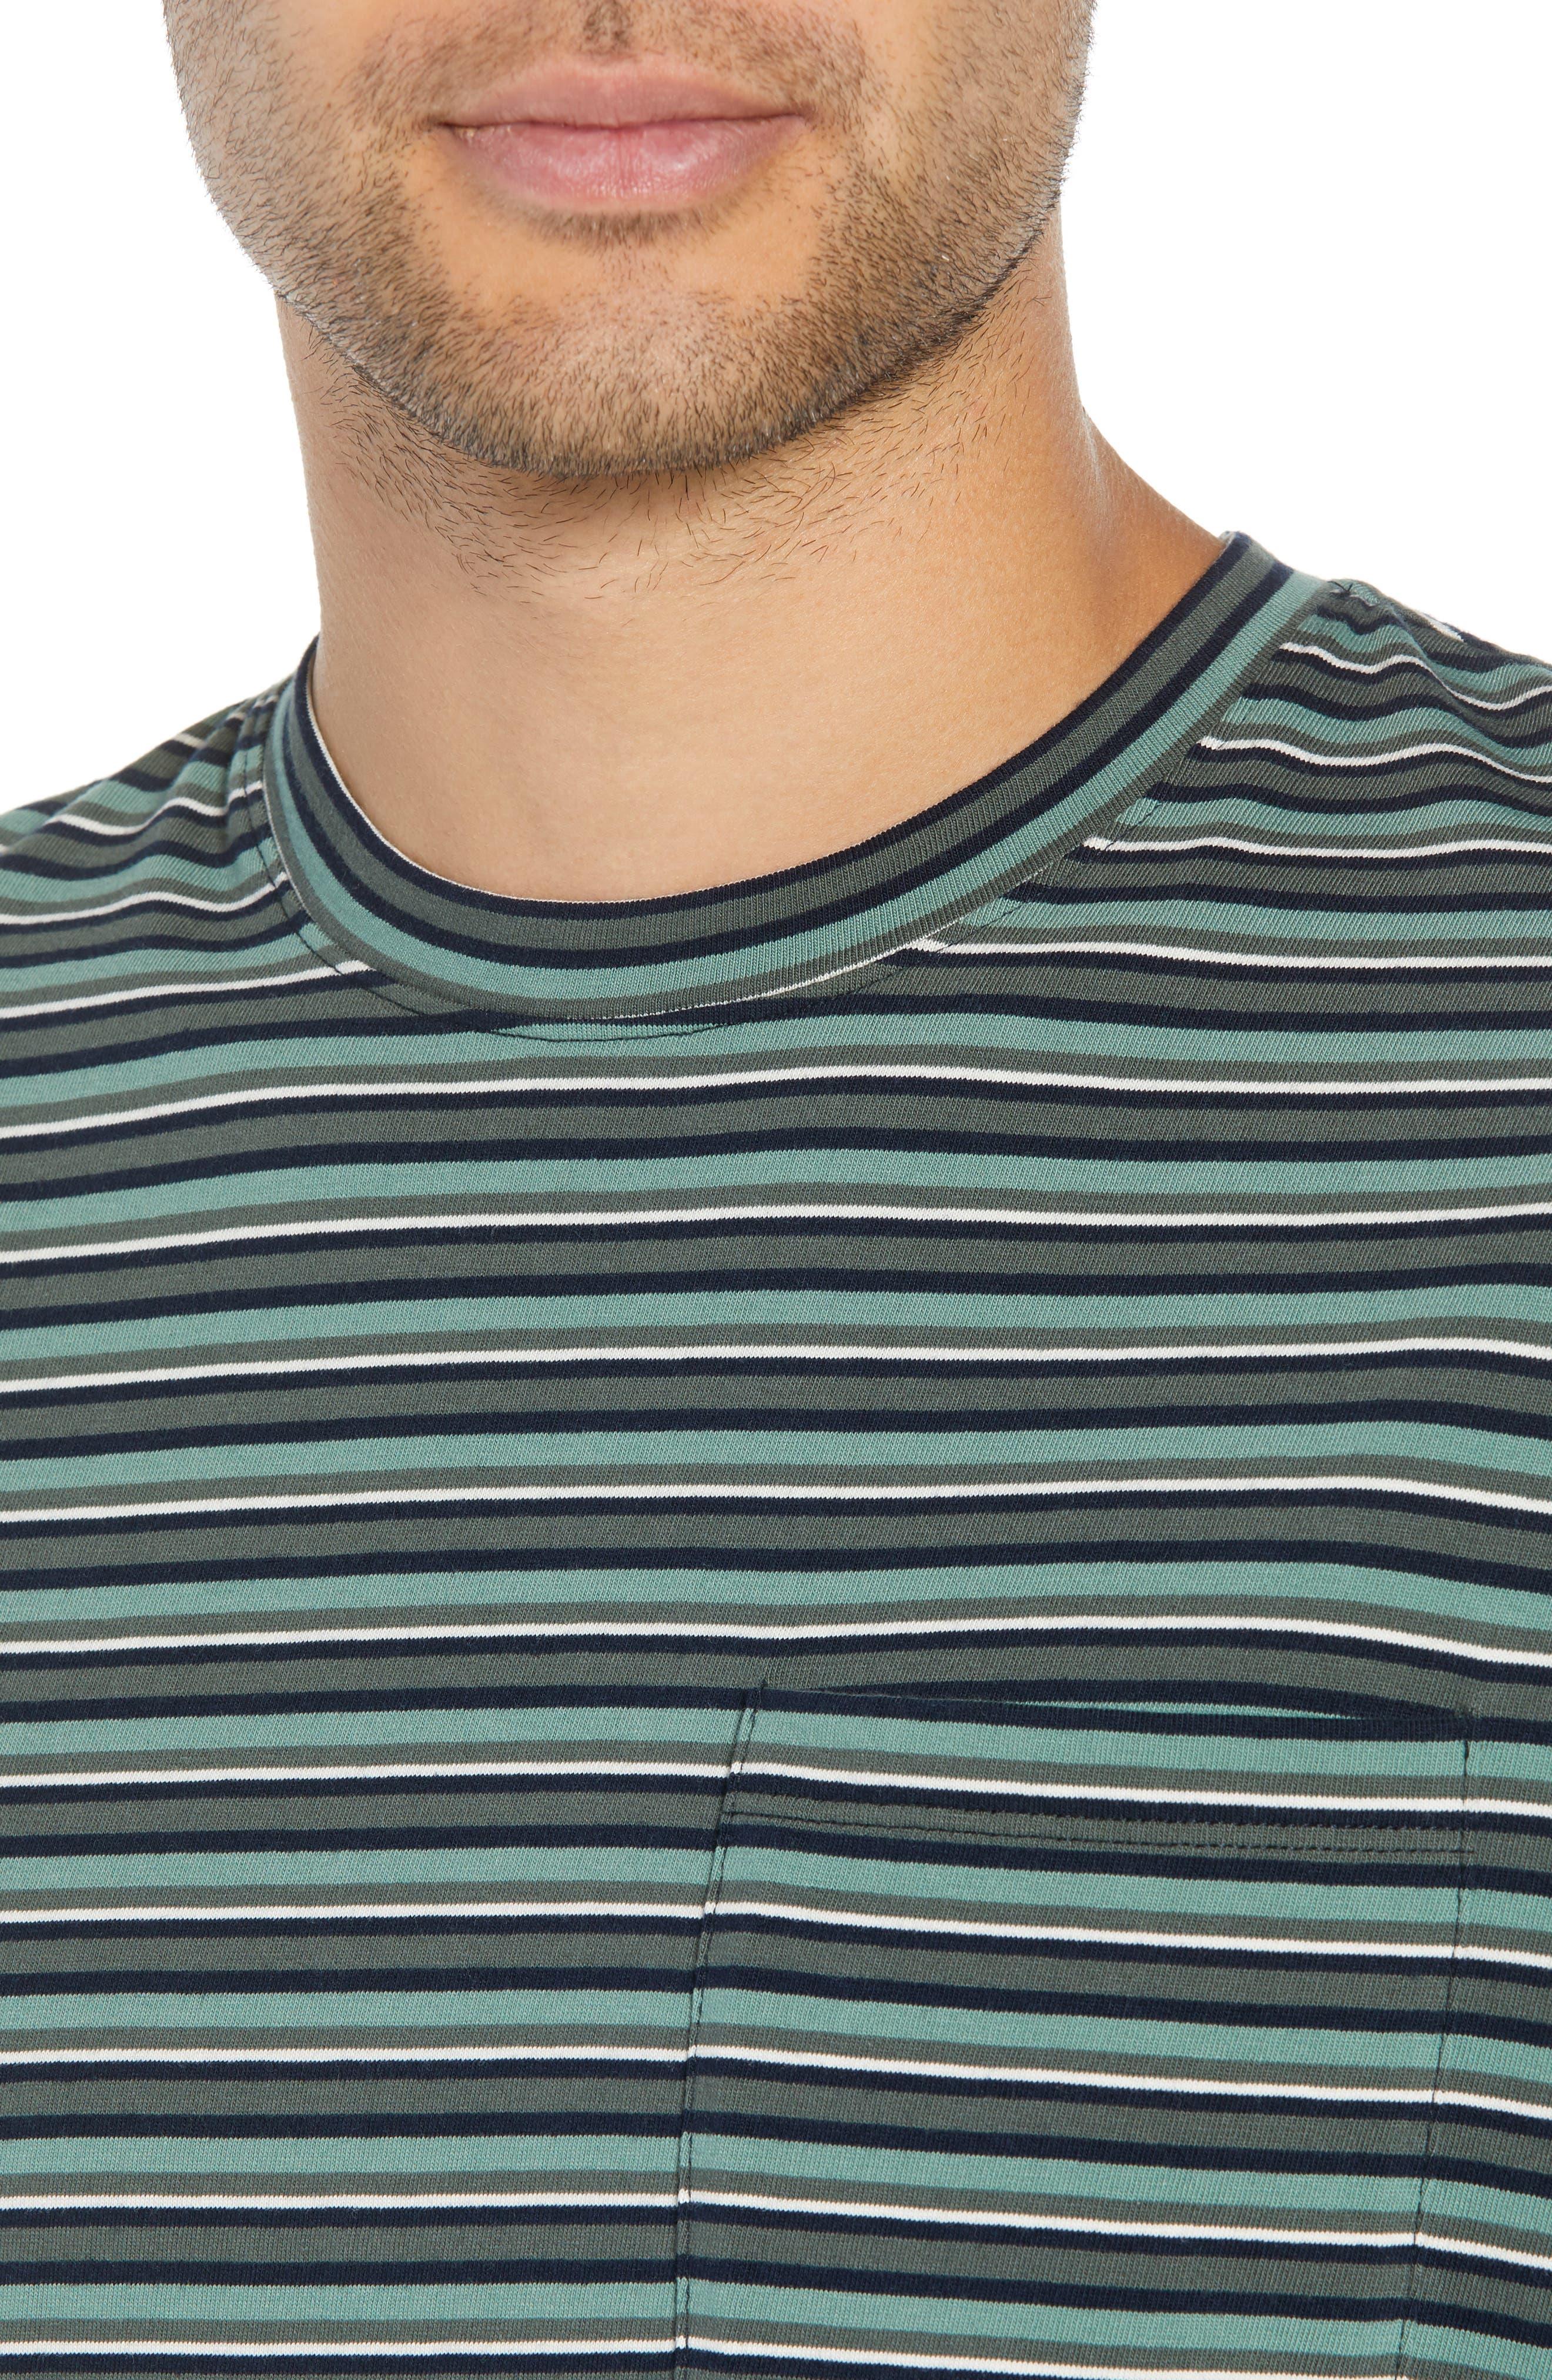 Regular Fit Multistripe Pocket T-Shirt,                             Alternate thumbnail 4, color,                             341